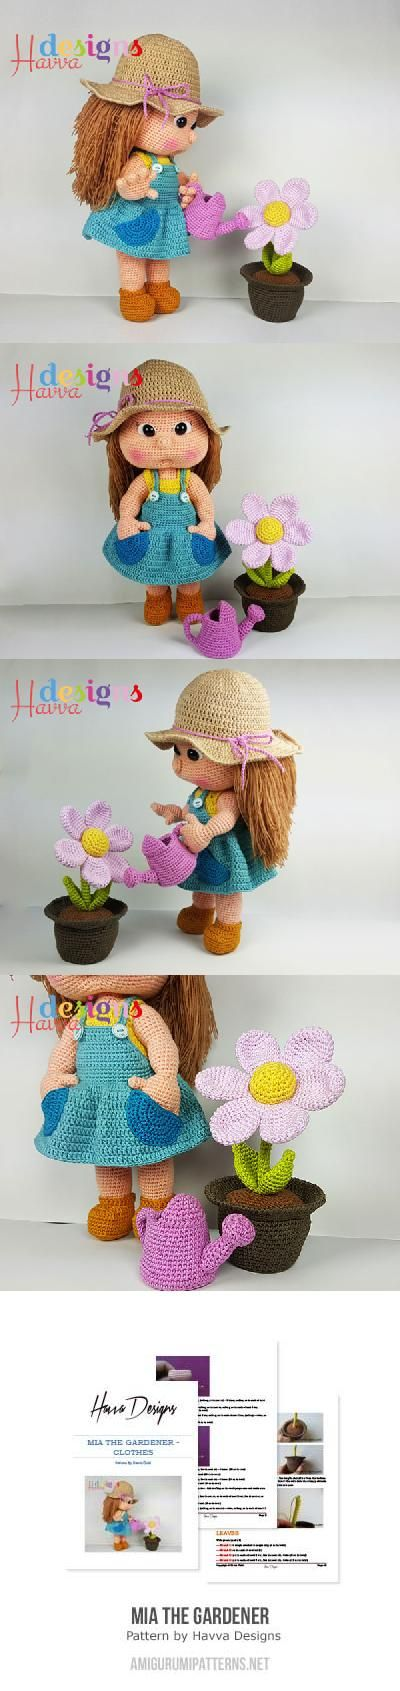 Mia the gardener amigurumi pattern by Havva Designs ...